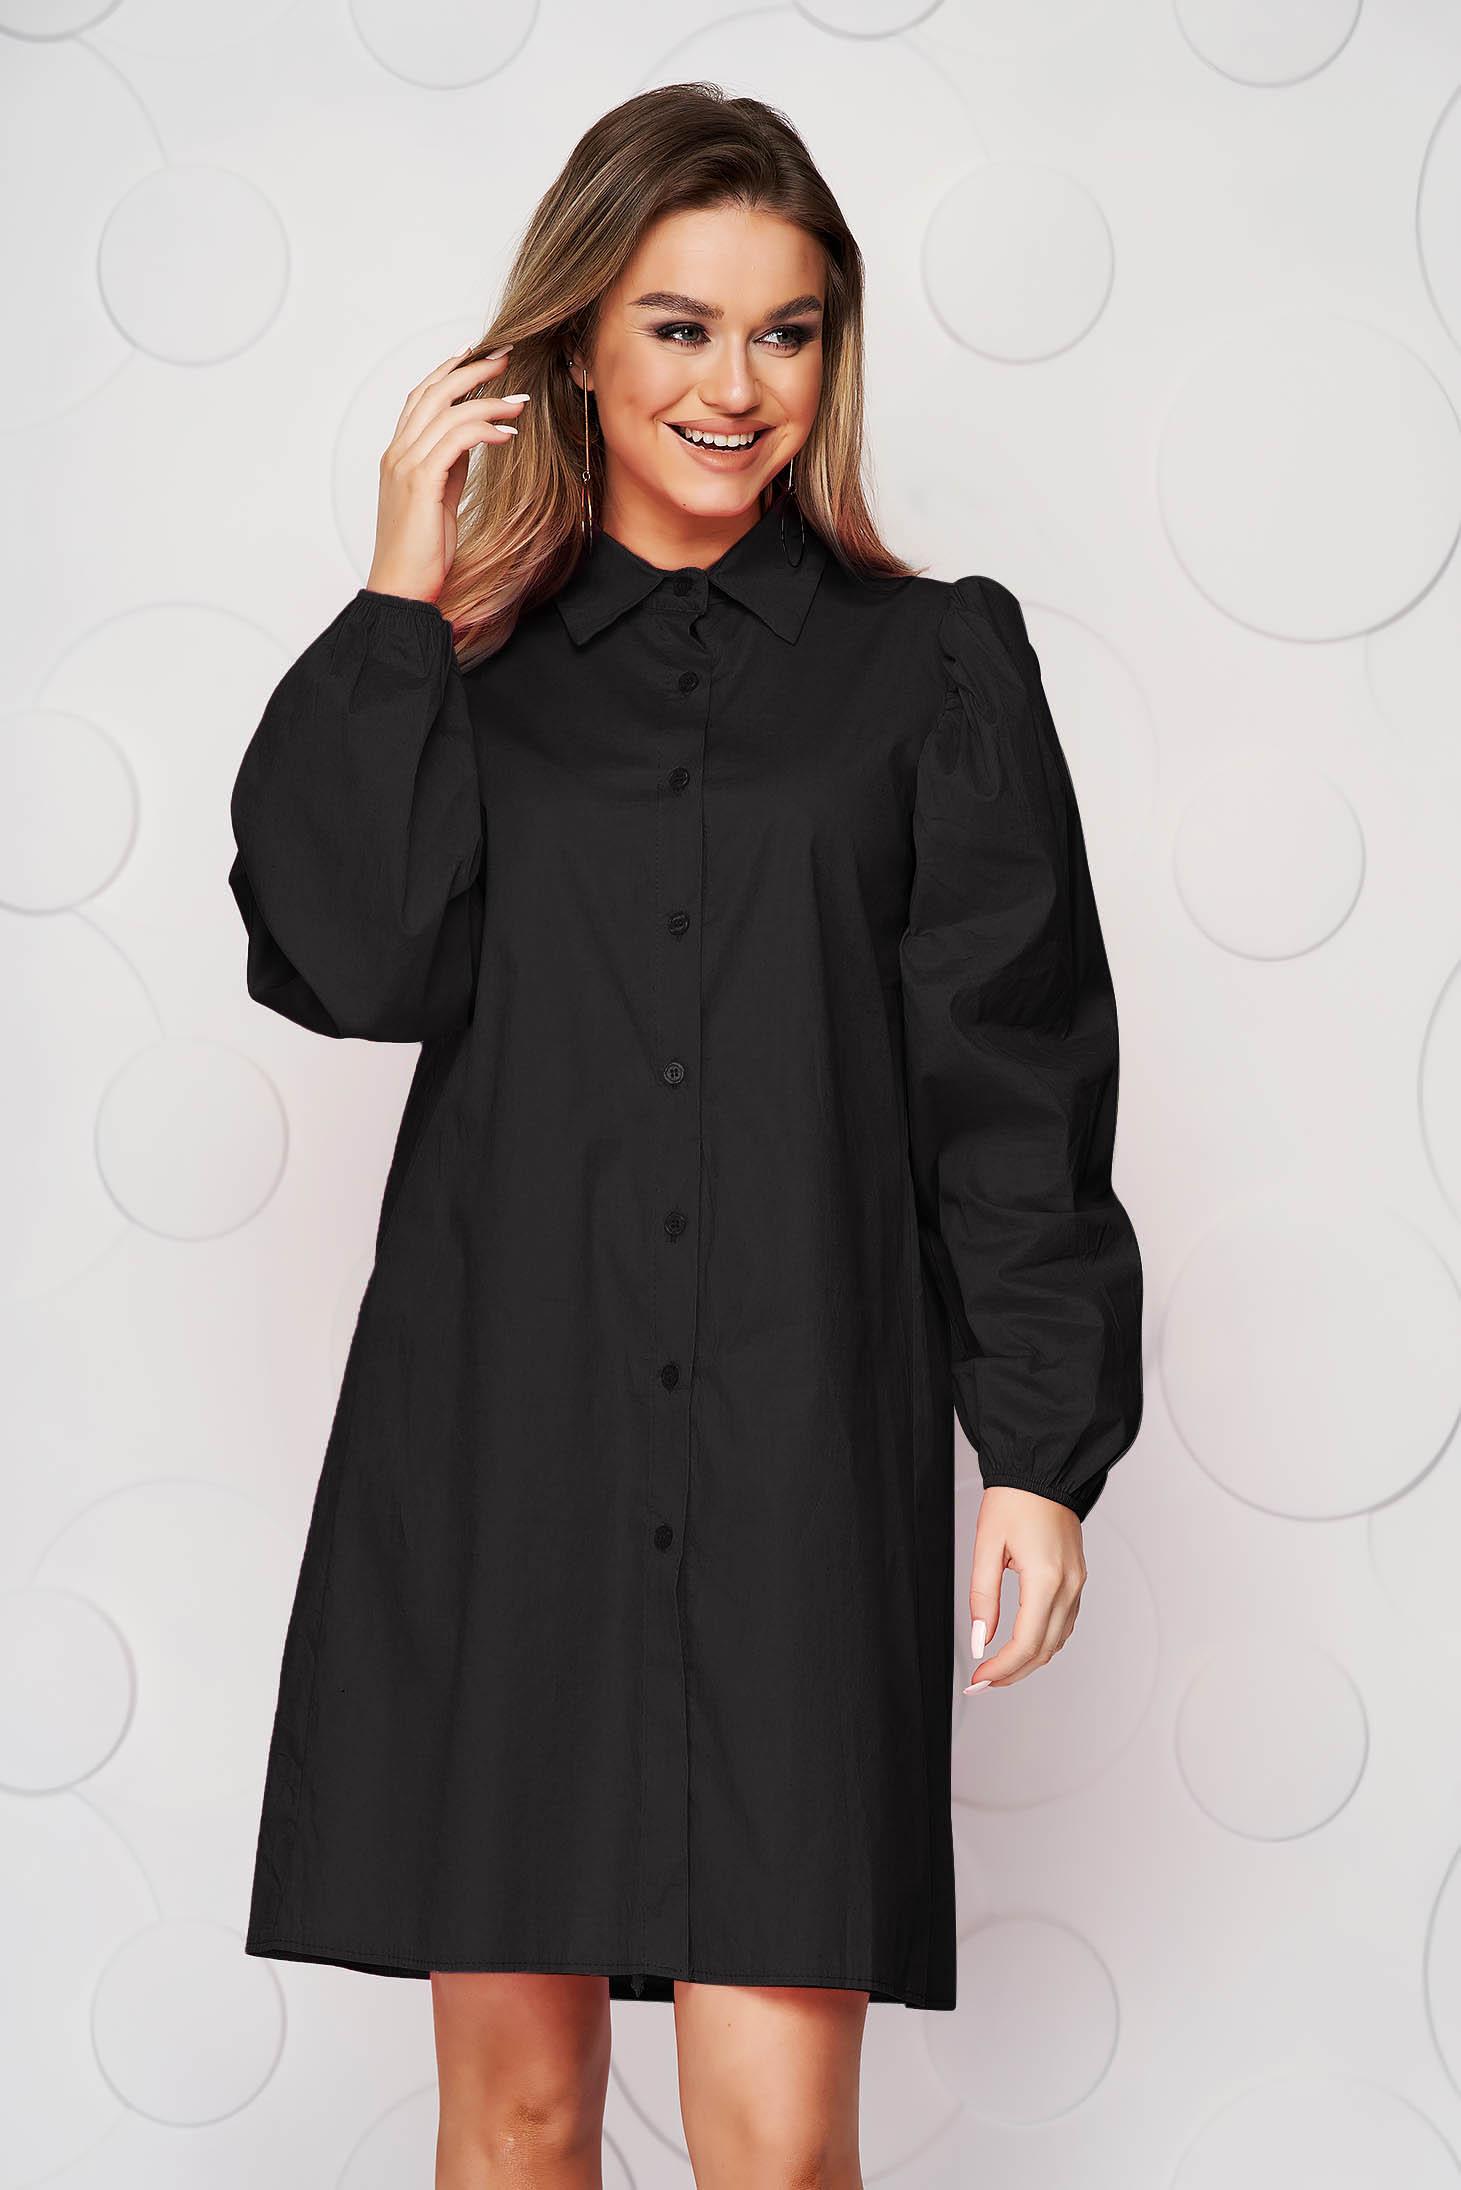 Black dress loose fit elastic held sleeves thin fabric